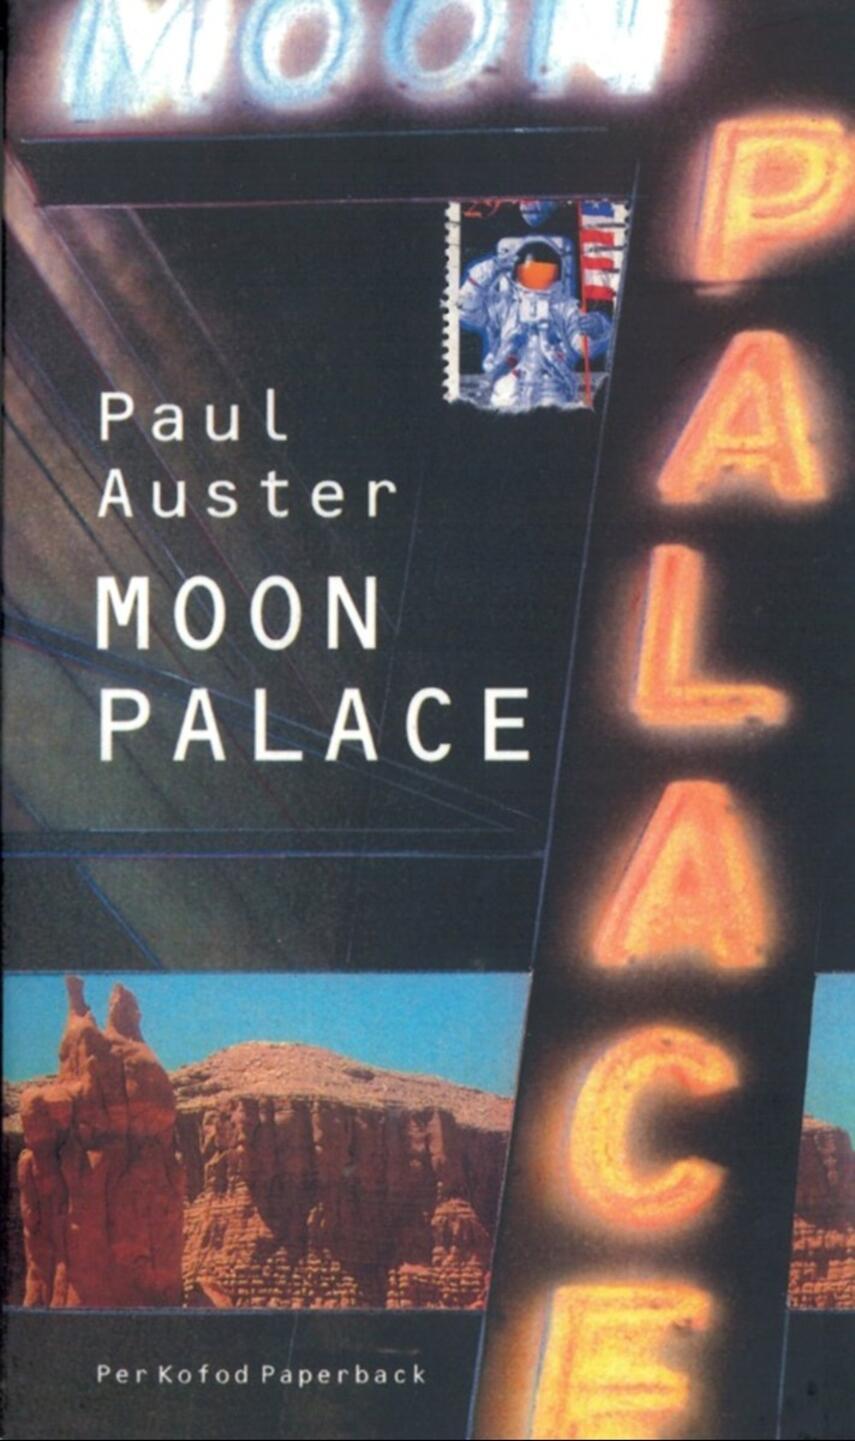 Paul Auster: Moon palace